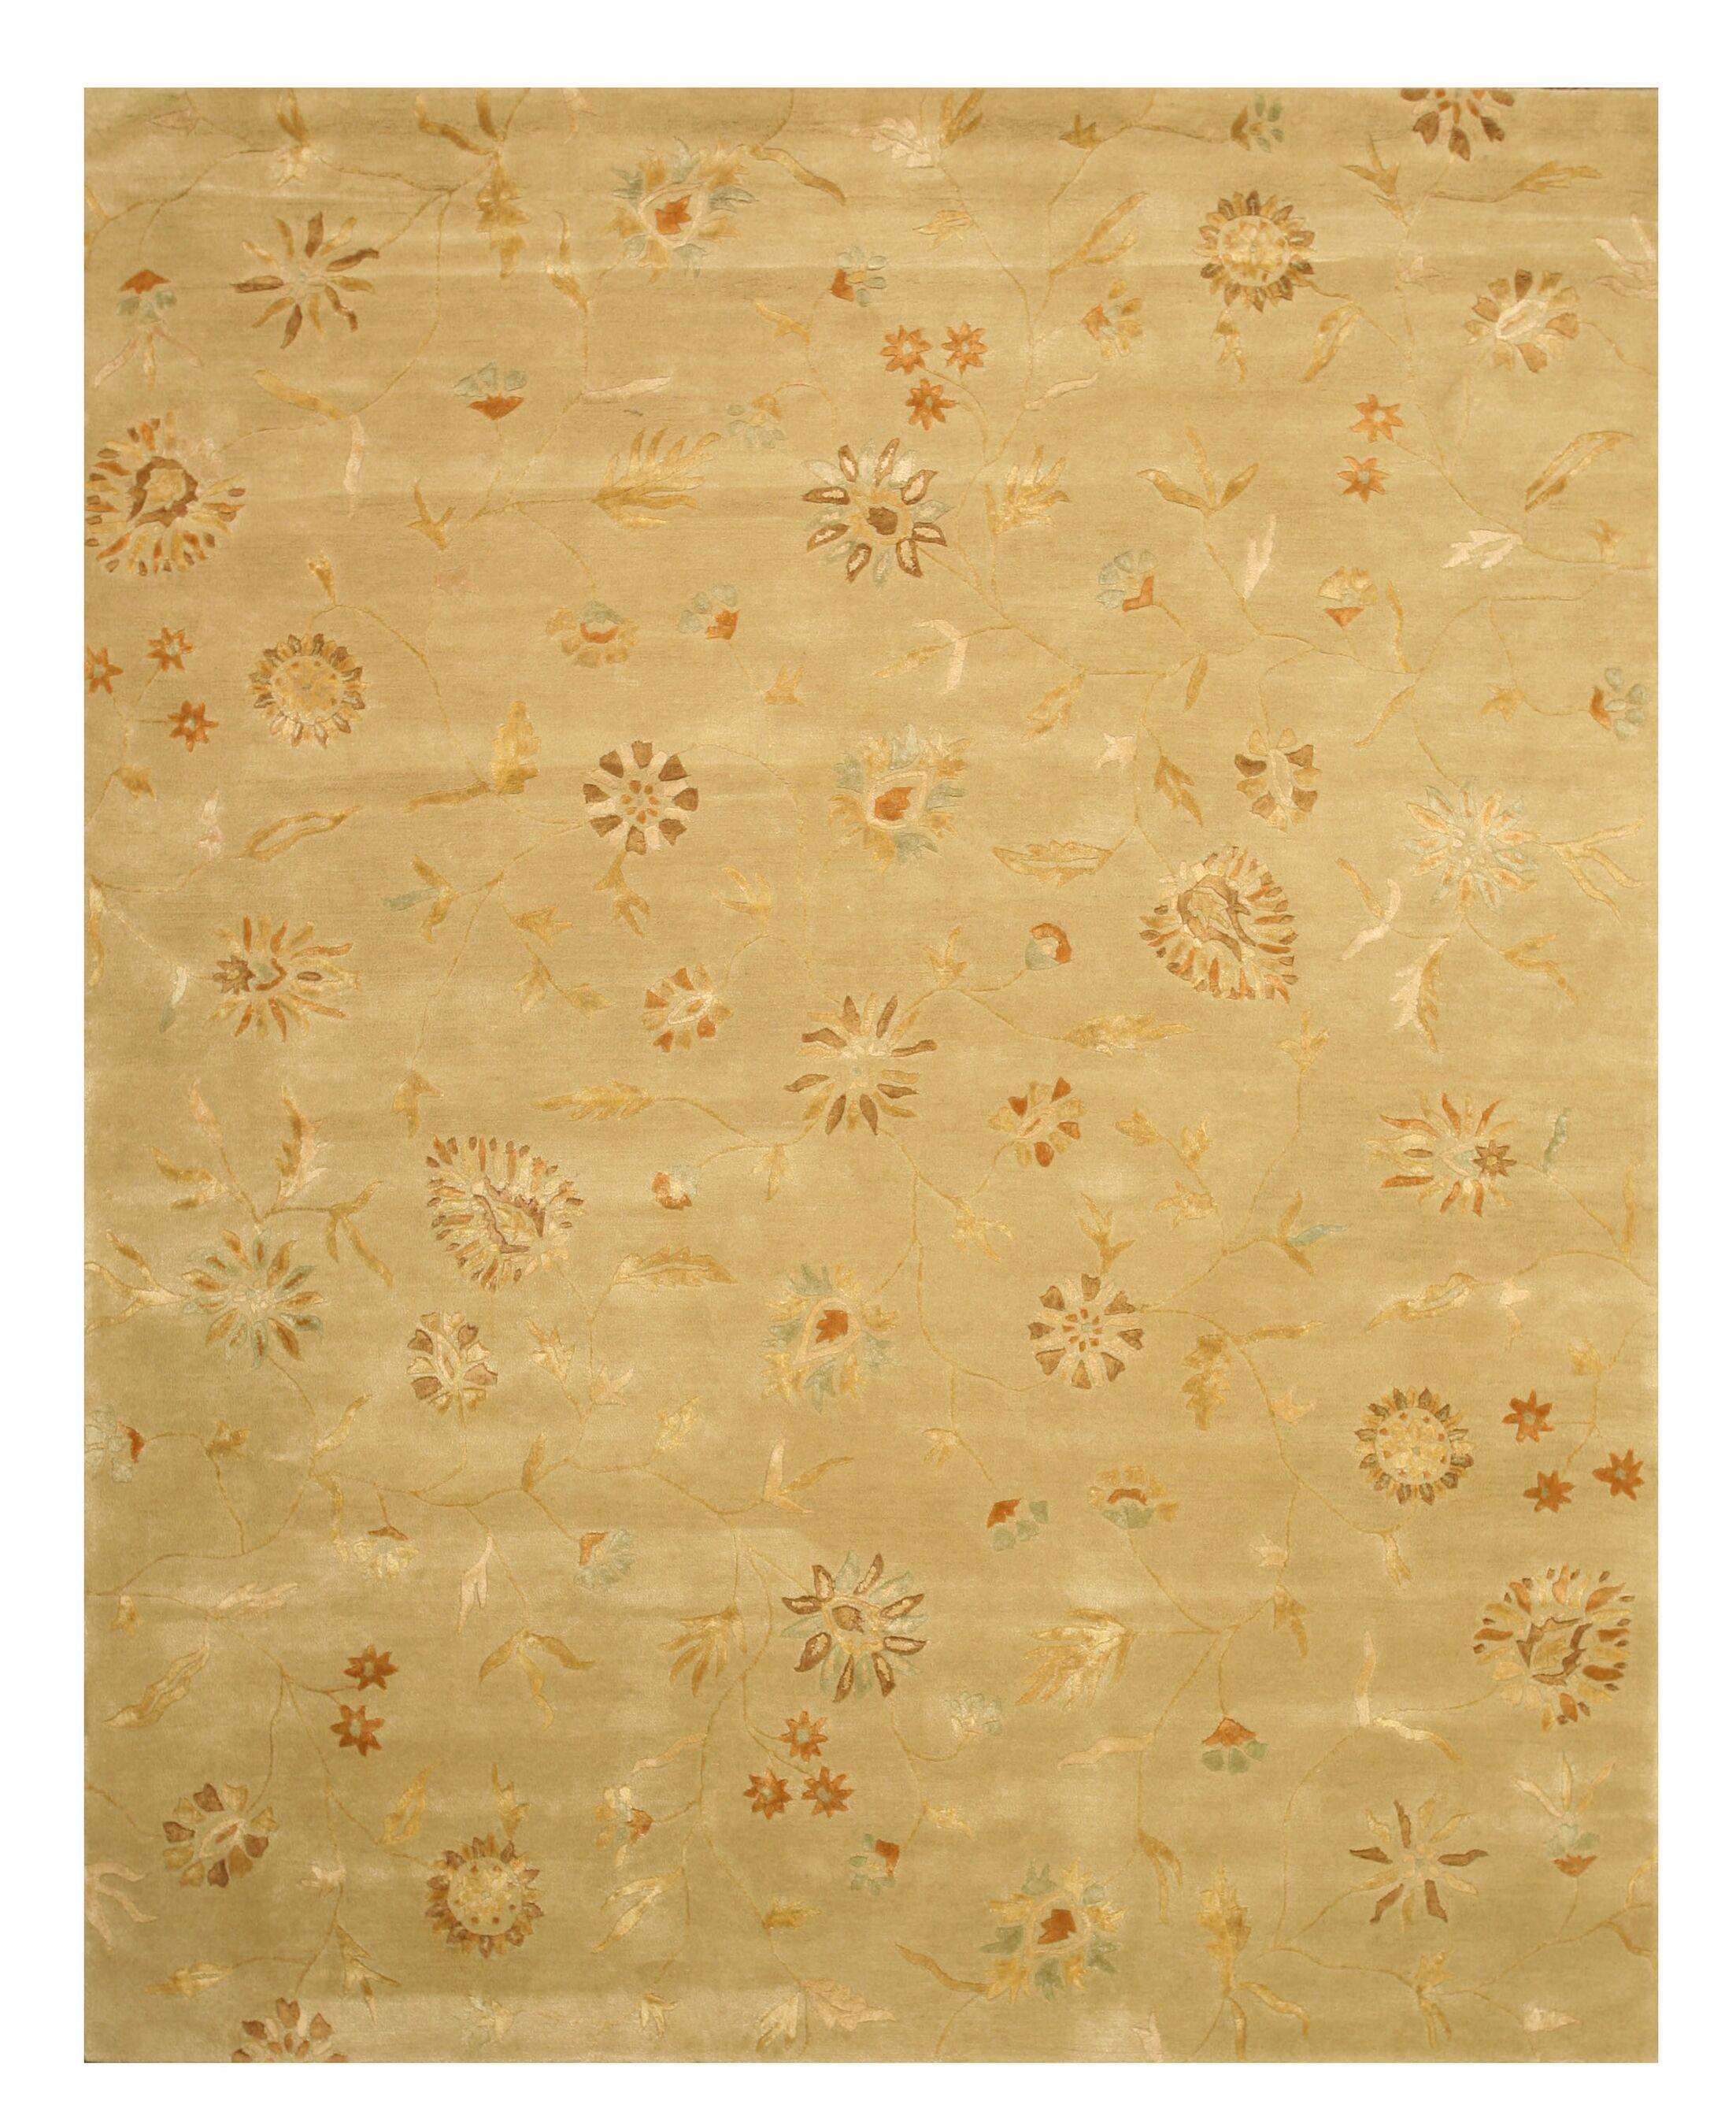 Macksburg Hand-Tufted Gold Area Rug Rug Size: Rectangle 4' x 6'